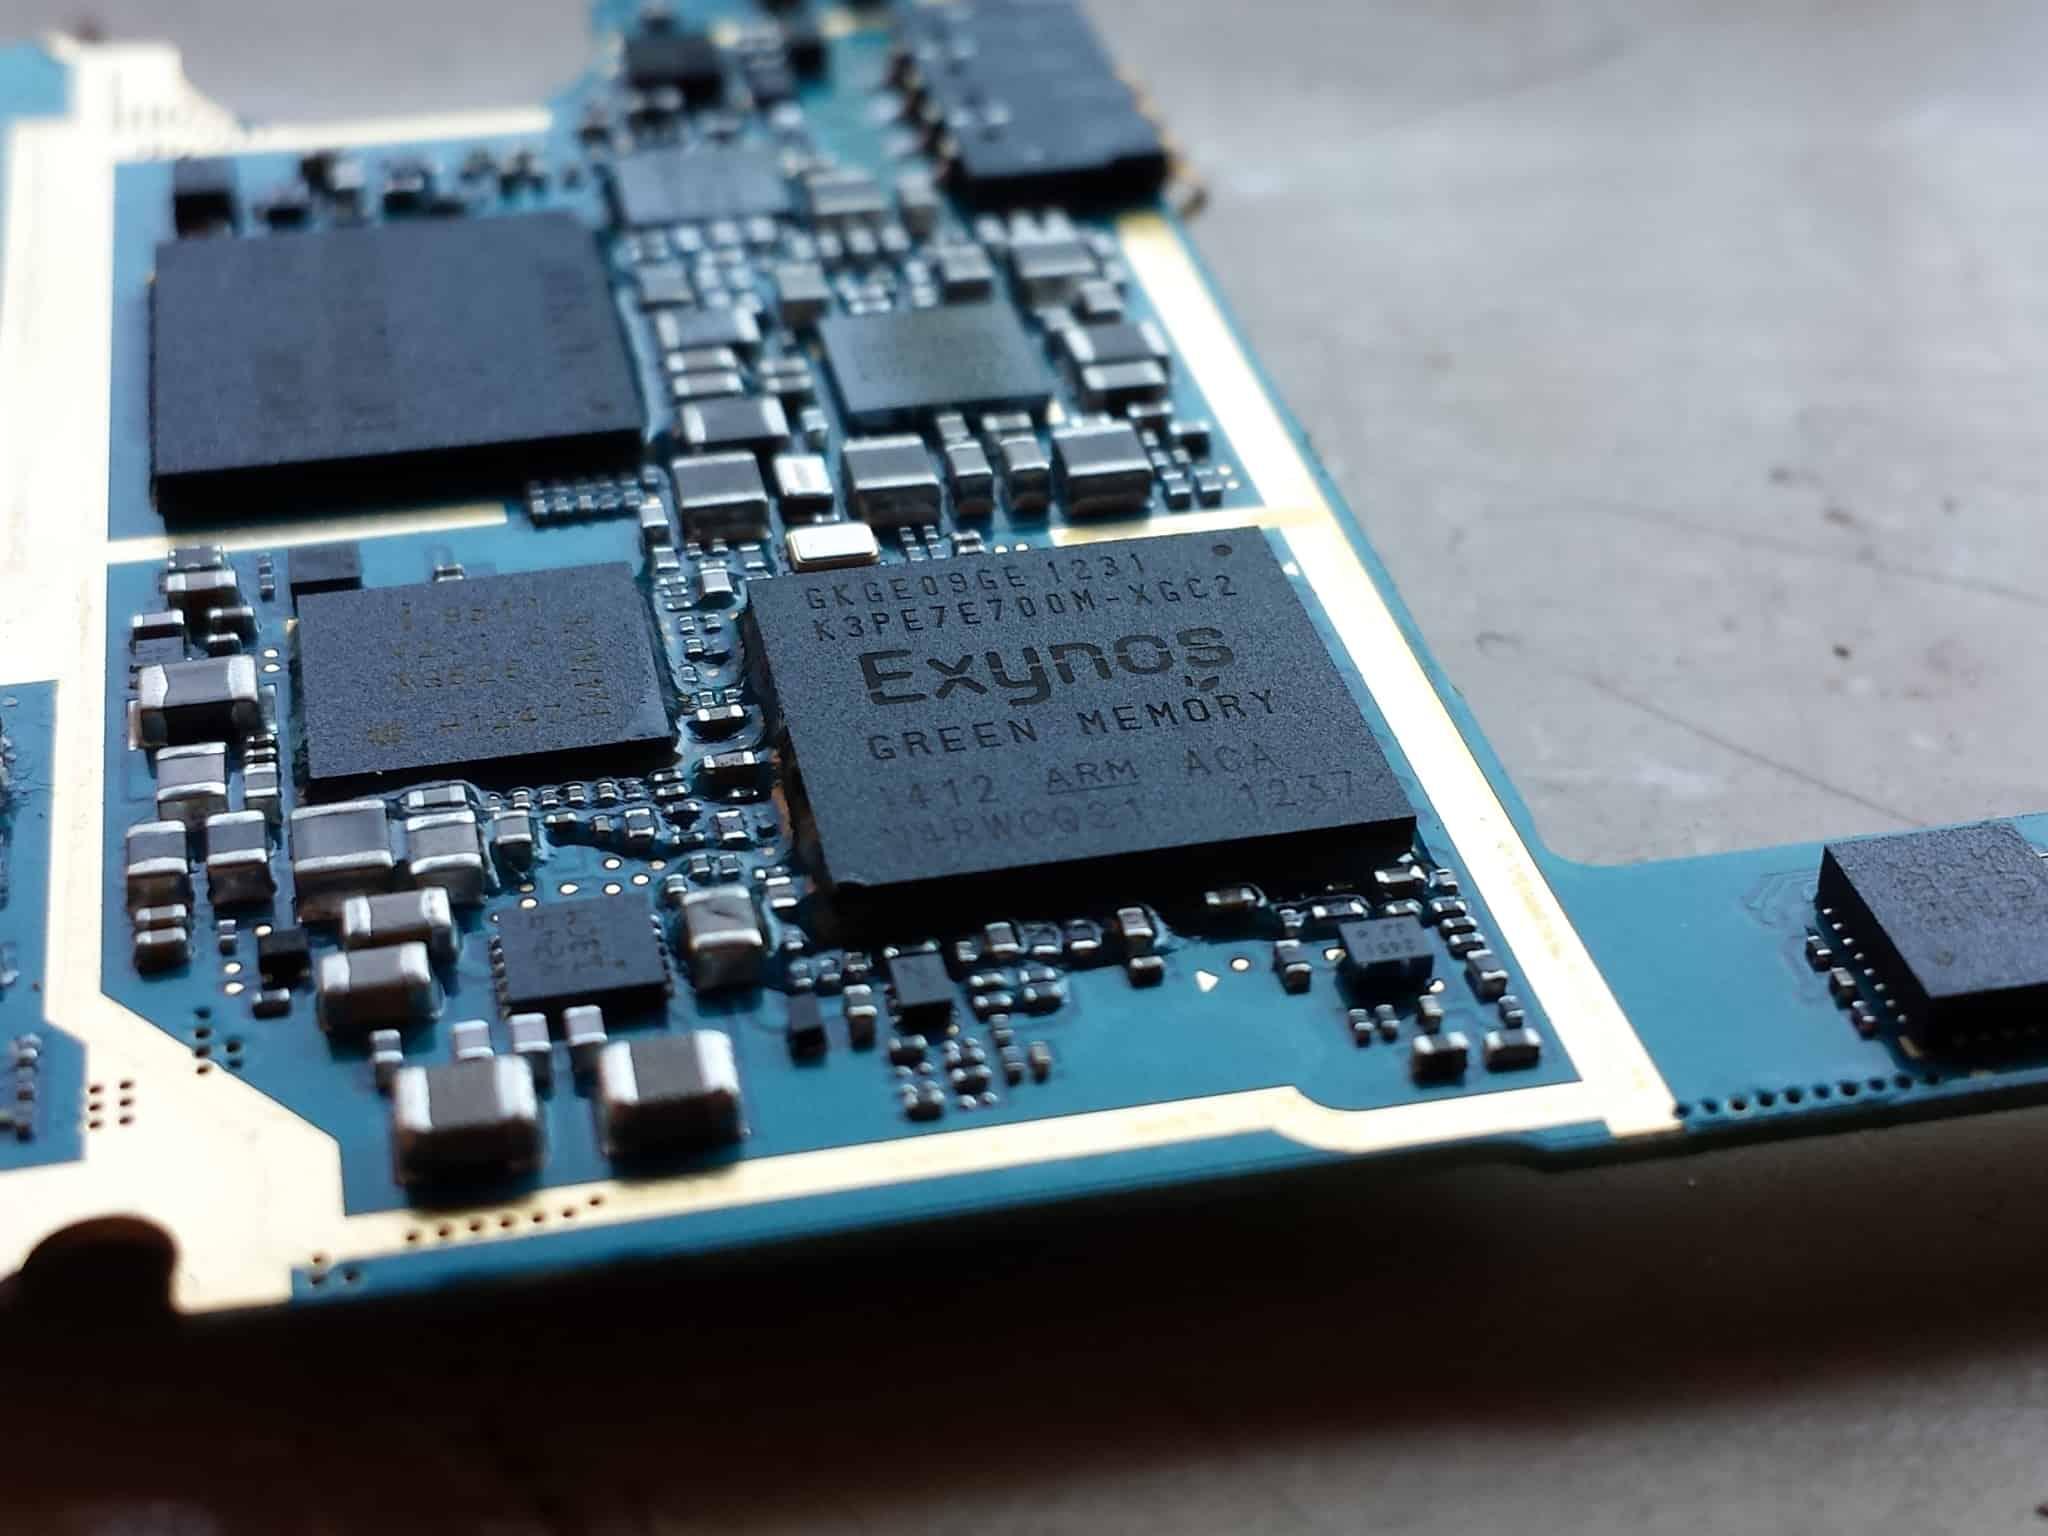 Samsung Exynos system-on-chip (SoC) chipset